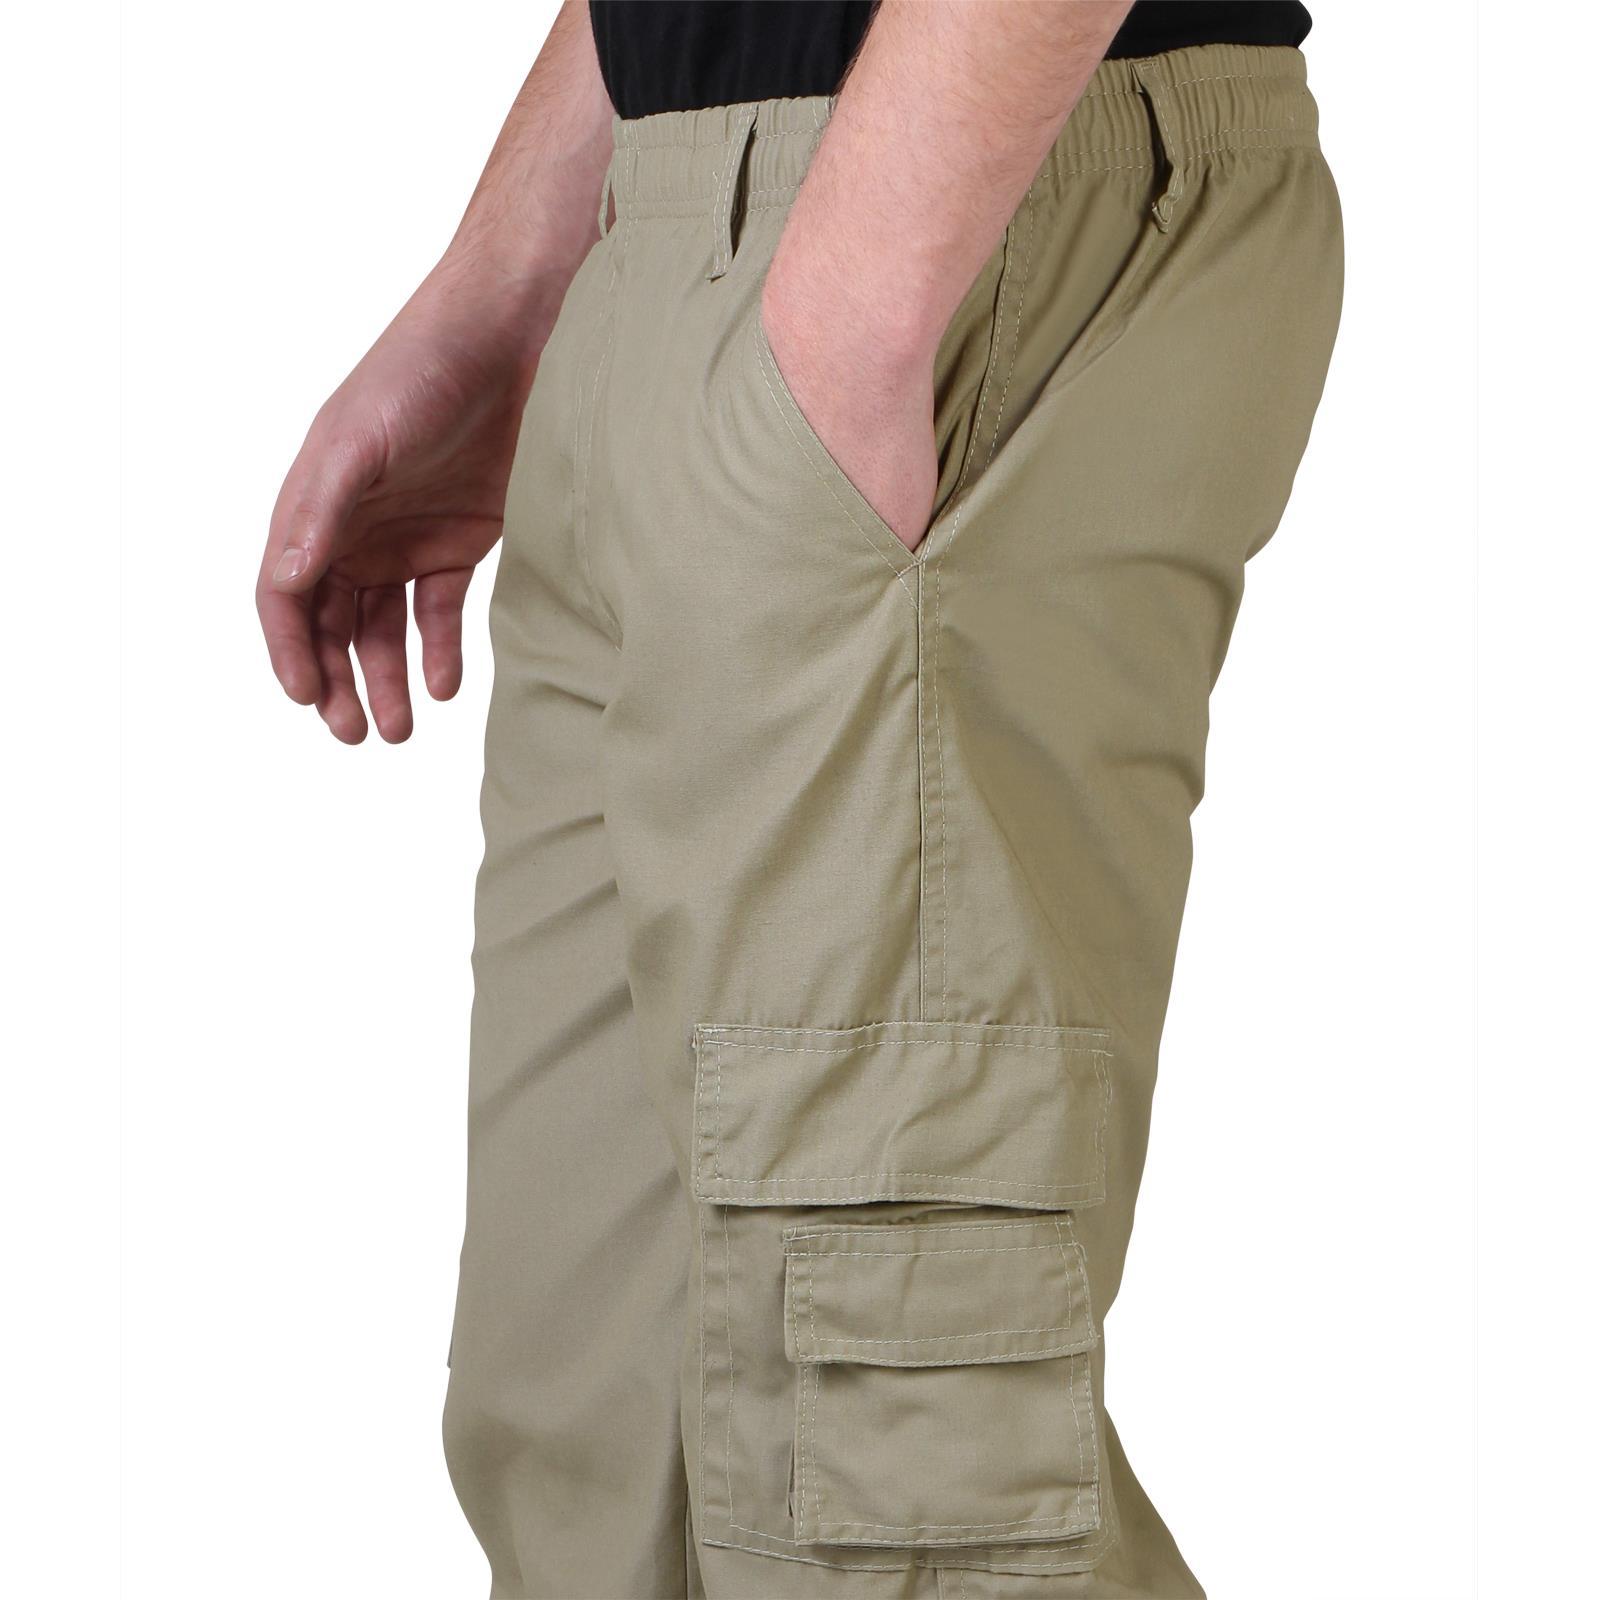 Pantalones-Hombre-Estilo-Cargo-Militar-Combate-Multibolsillos-Casual miniatura 9